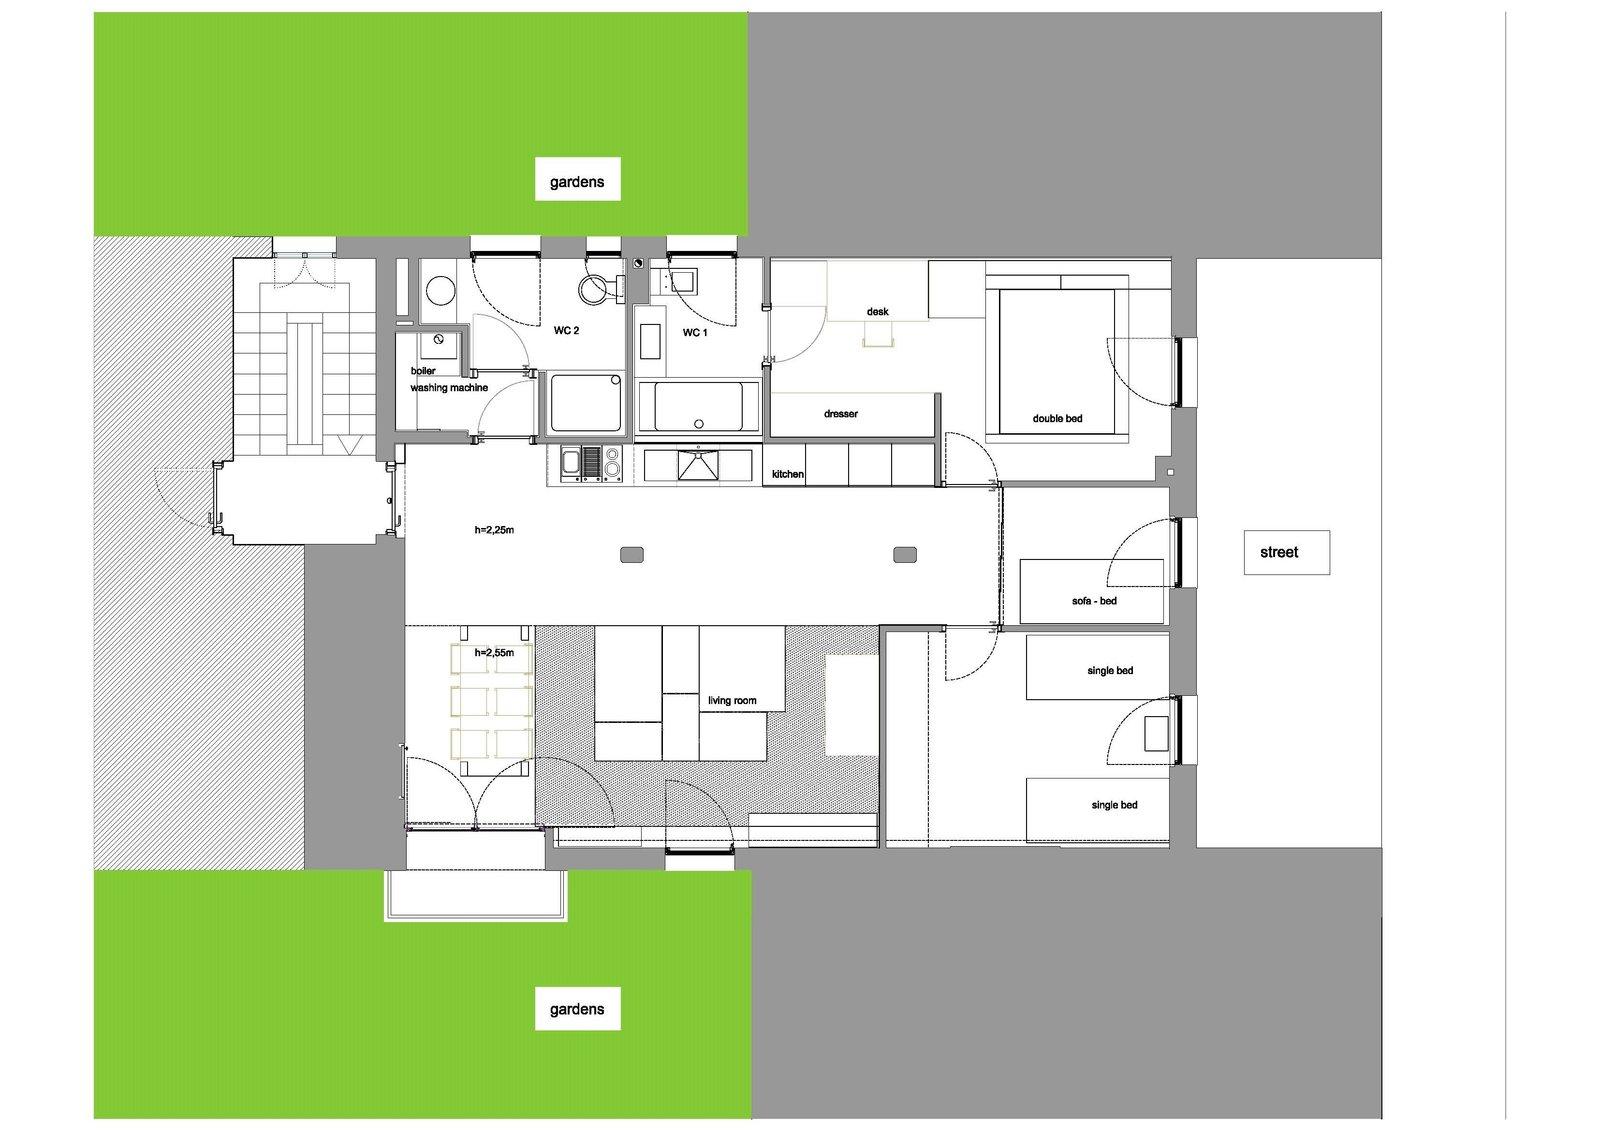 Plan of the apartment  Echávarri house 100m2. Loft between gardens.